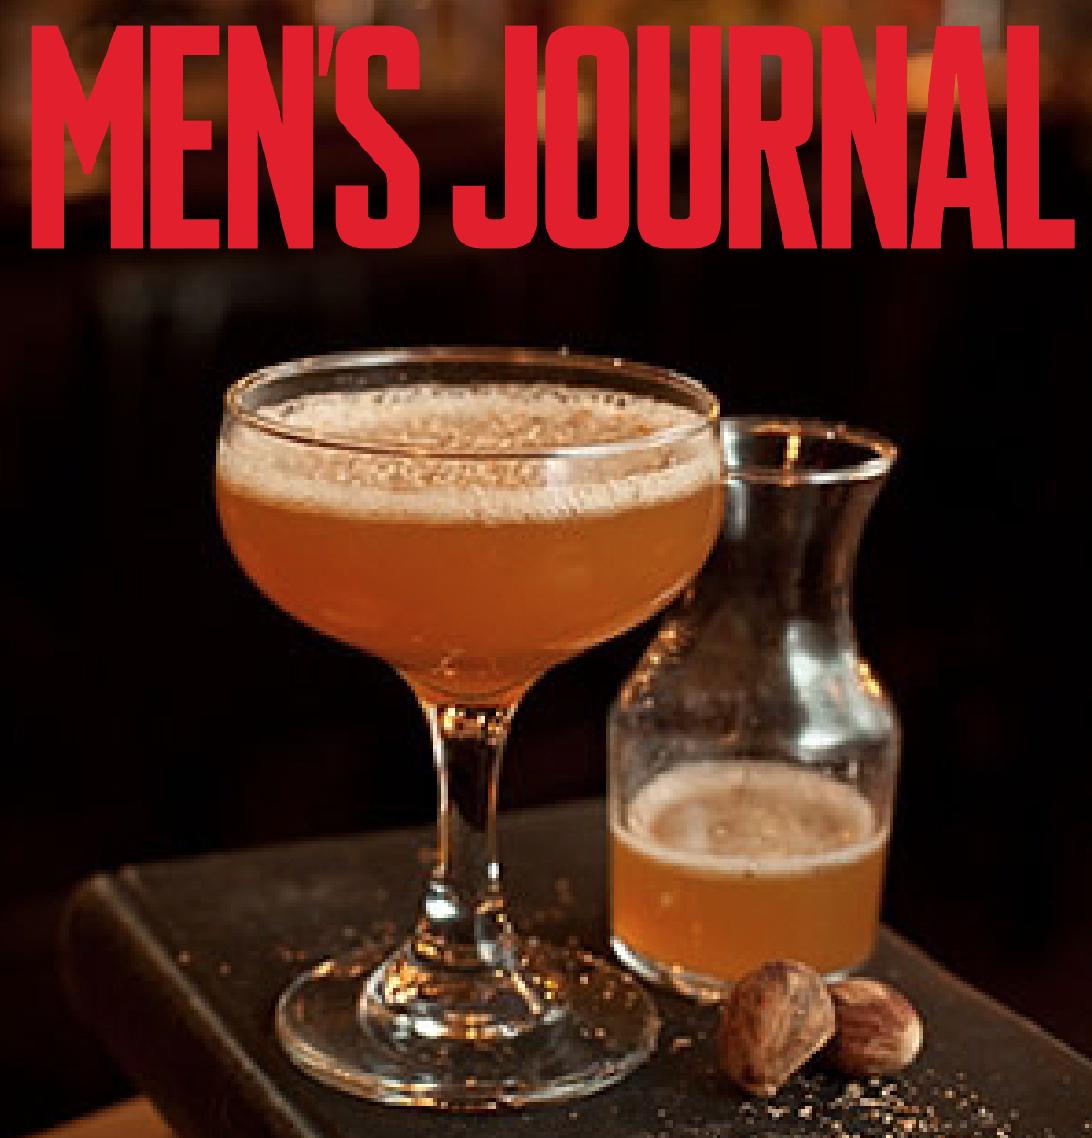 Men's Journal features a delicious cocktail featuring Belle Meade Bourbon